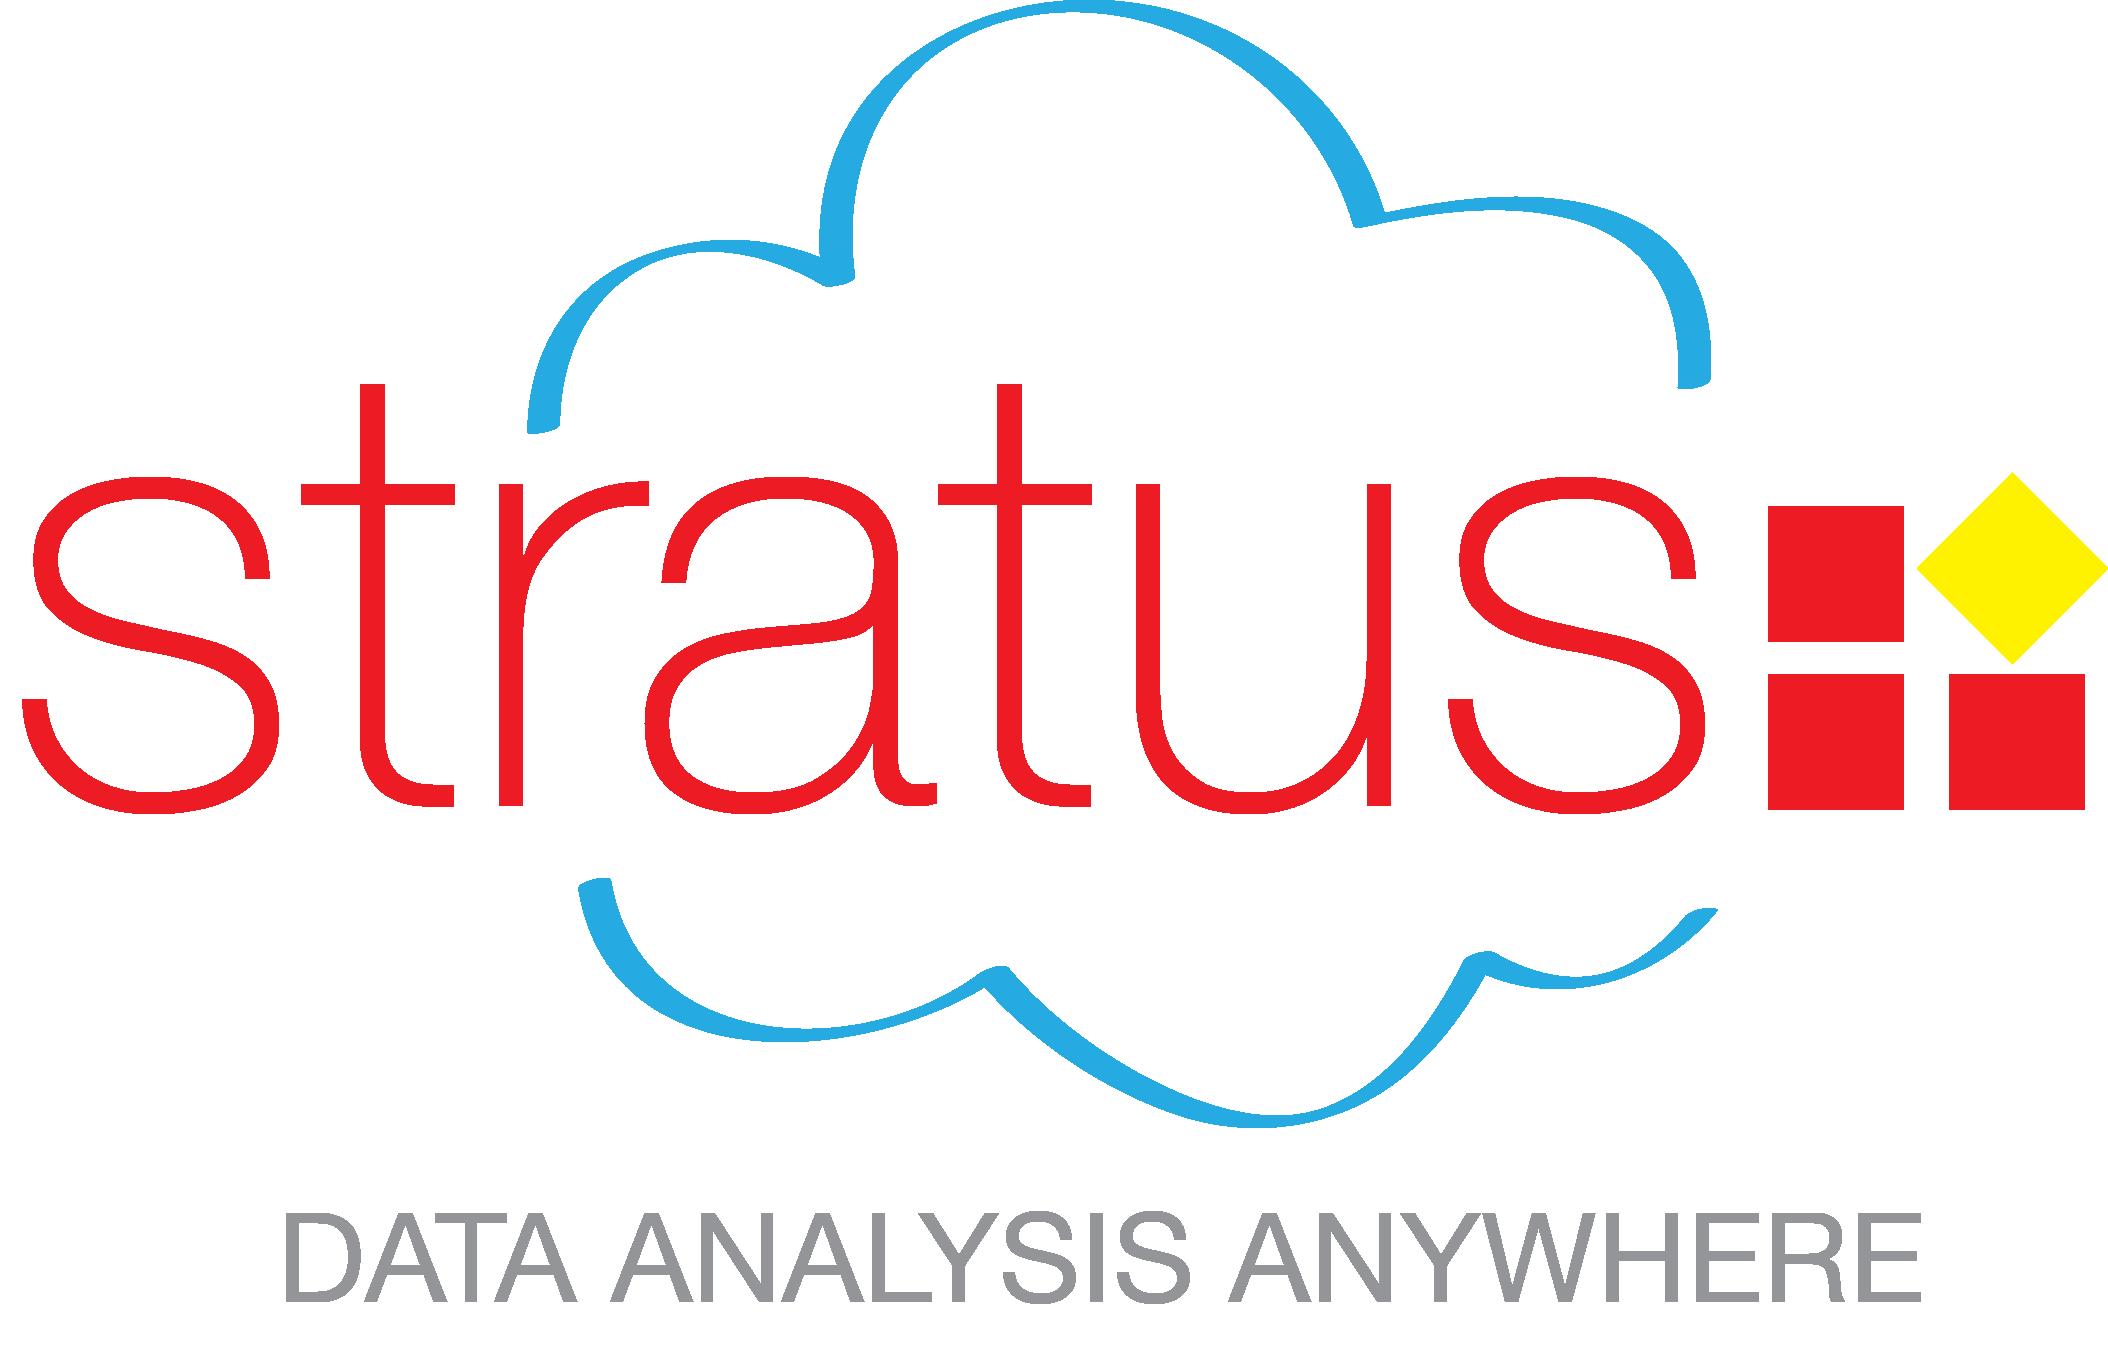 Stratus_logo_data_analysis_anywhere